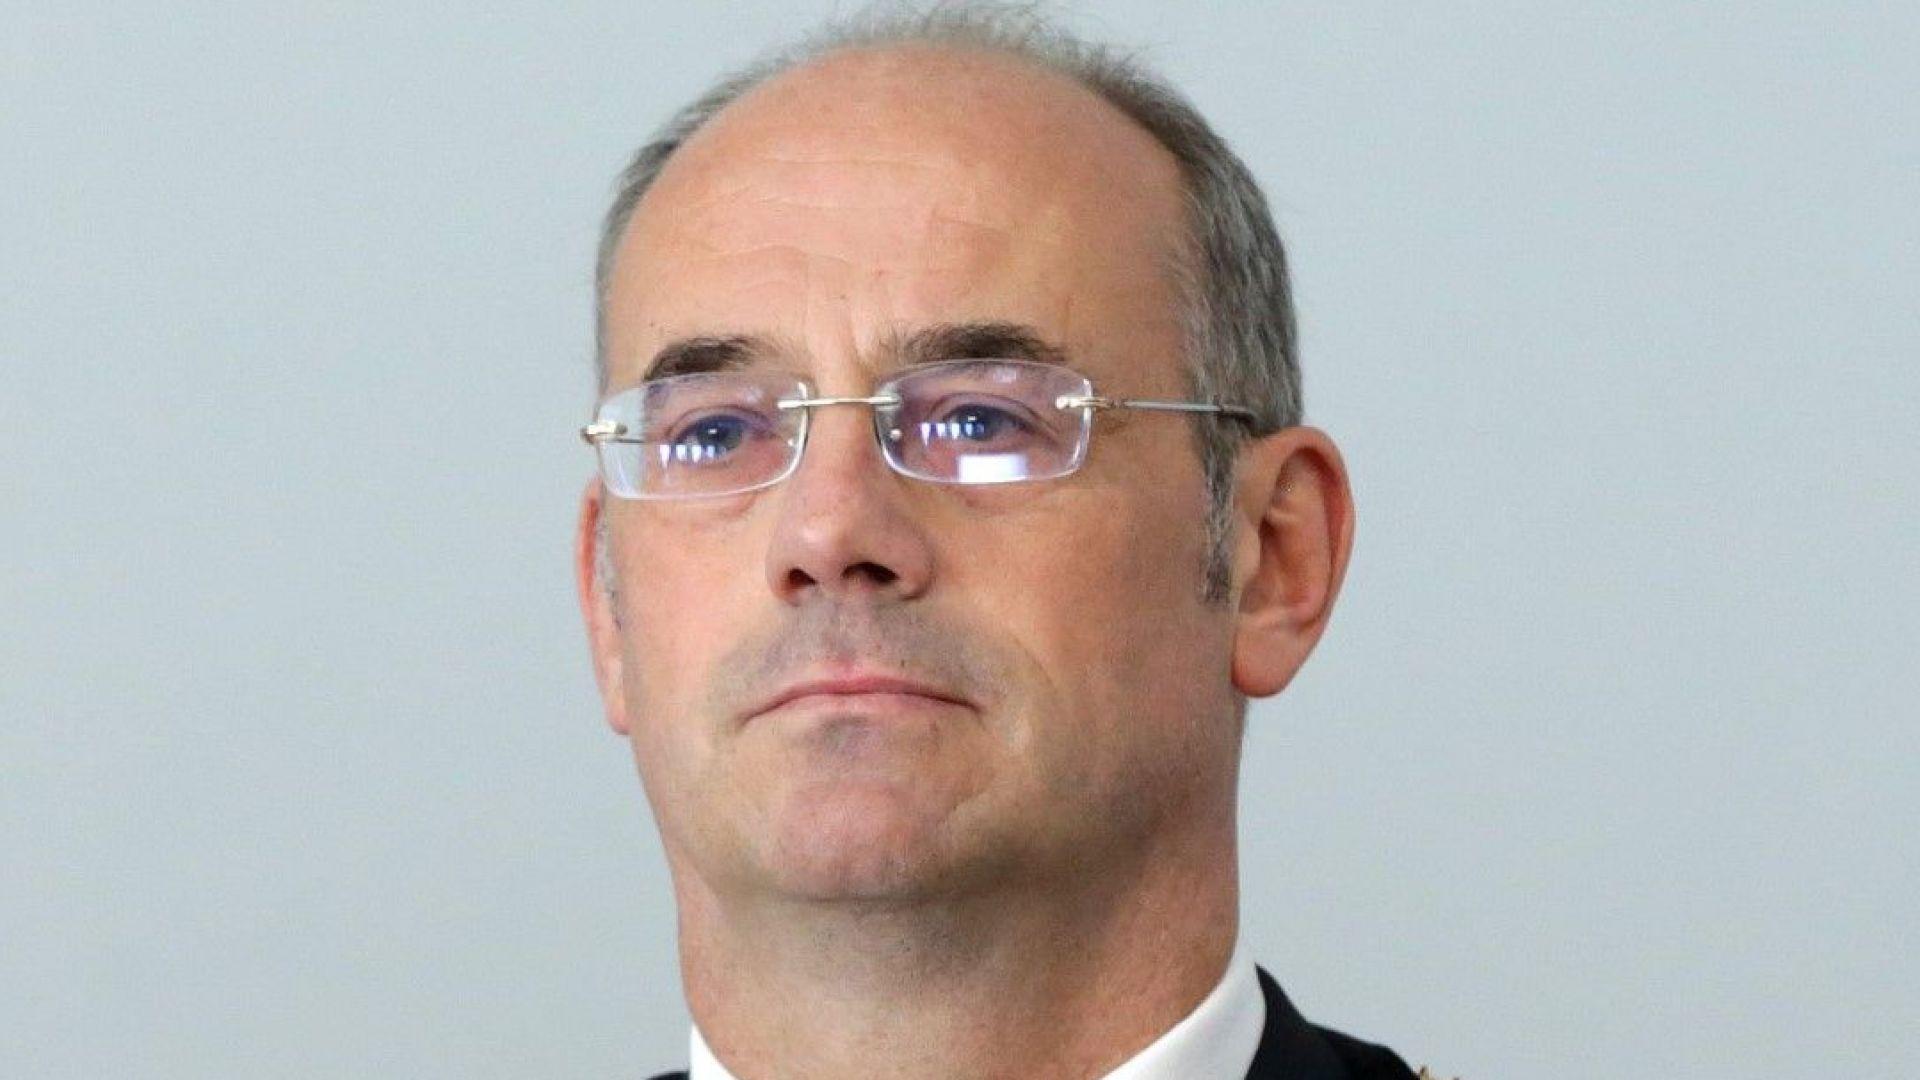 Румен Радев: Действията срещу Атанас Семов са с политическа цел